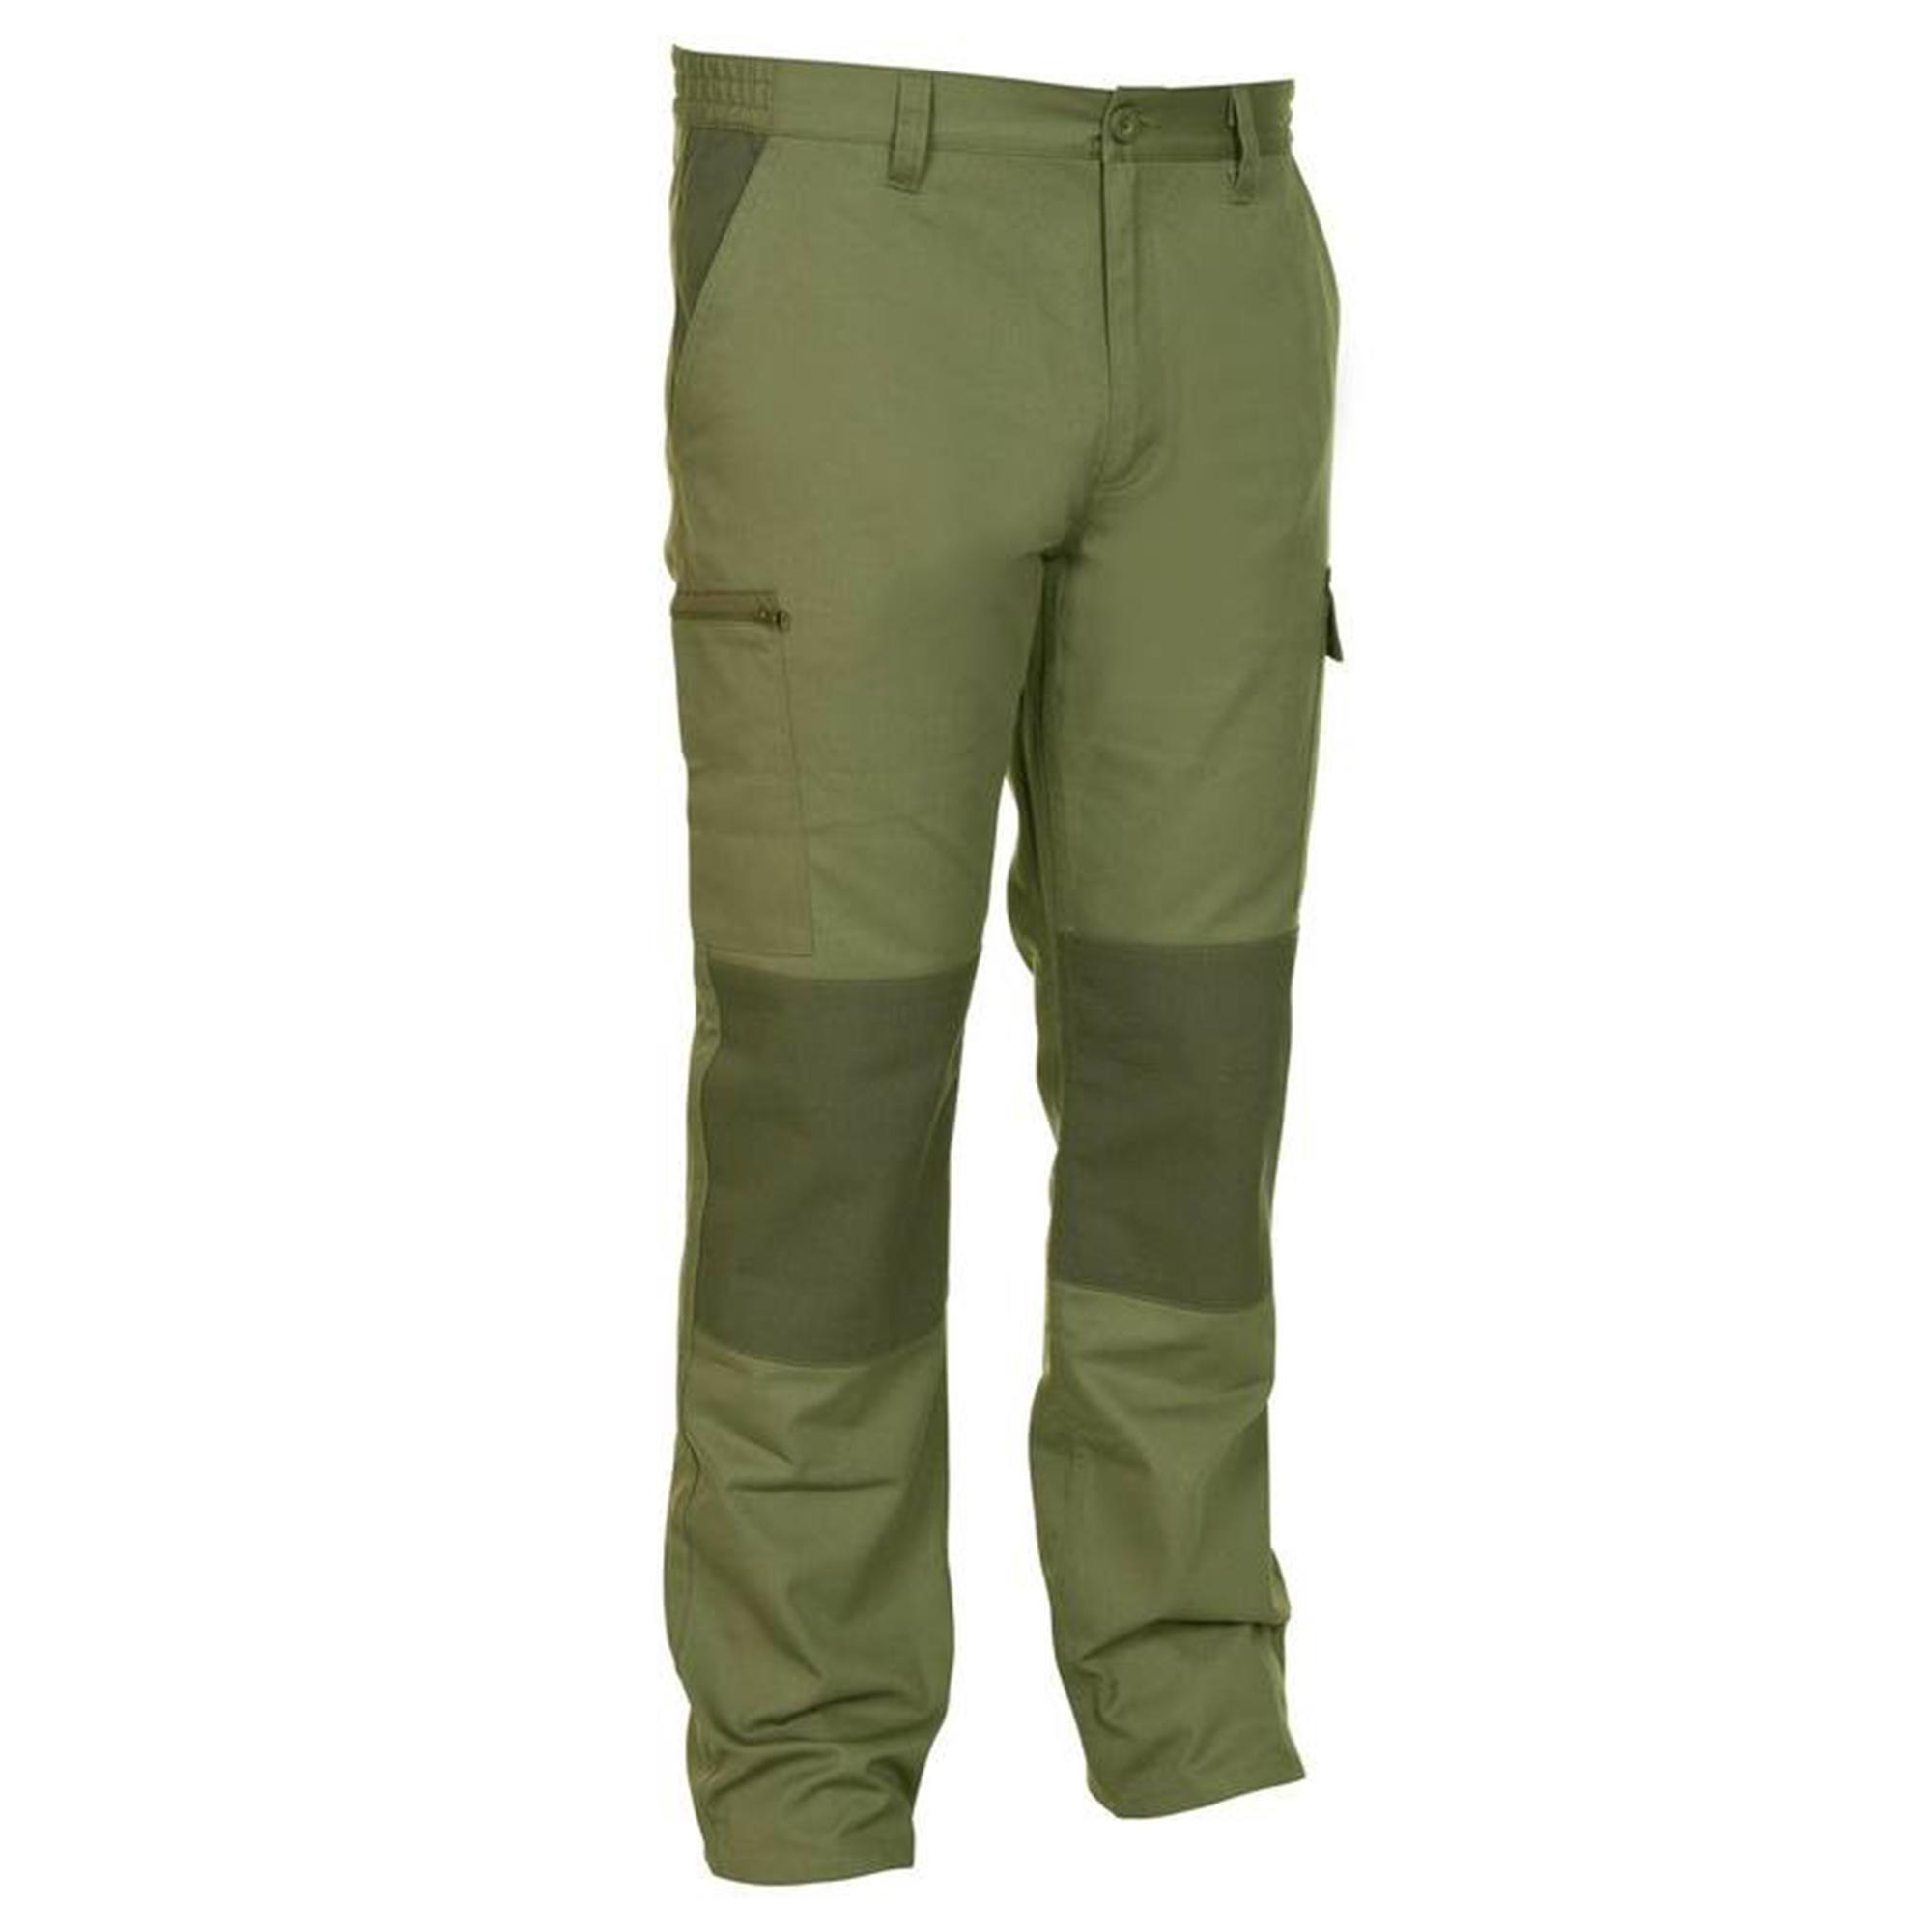 Jagdhose Steppe 300 zweifarbig | Sportbekleidung > Sporthosen > Trekkinghosen | Solognac